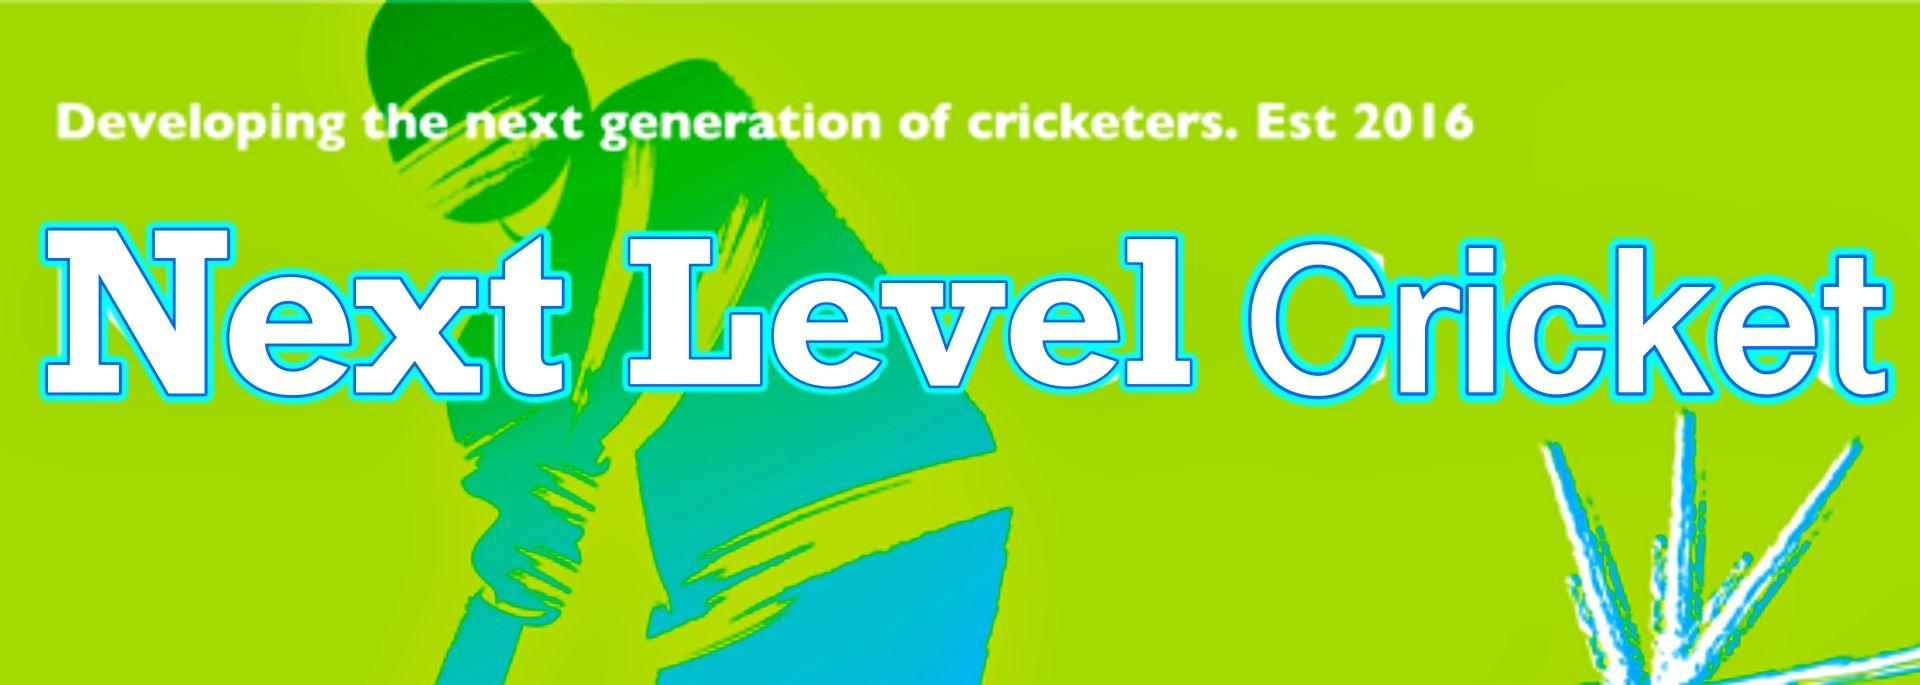 Next Level Cricket channel